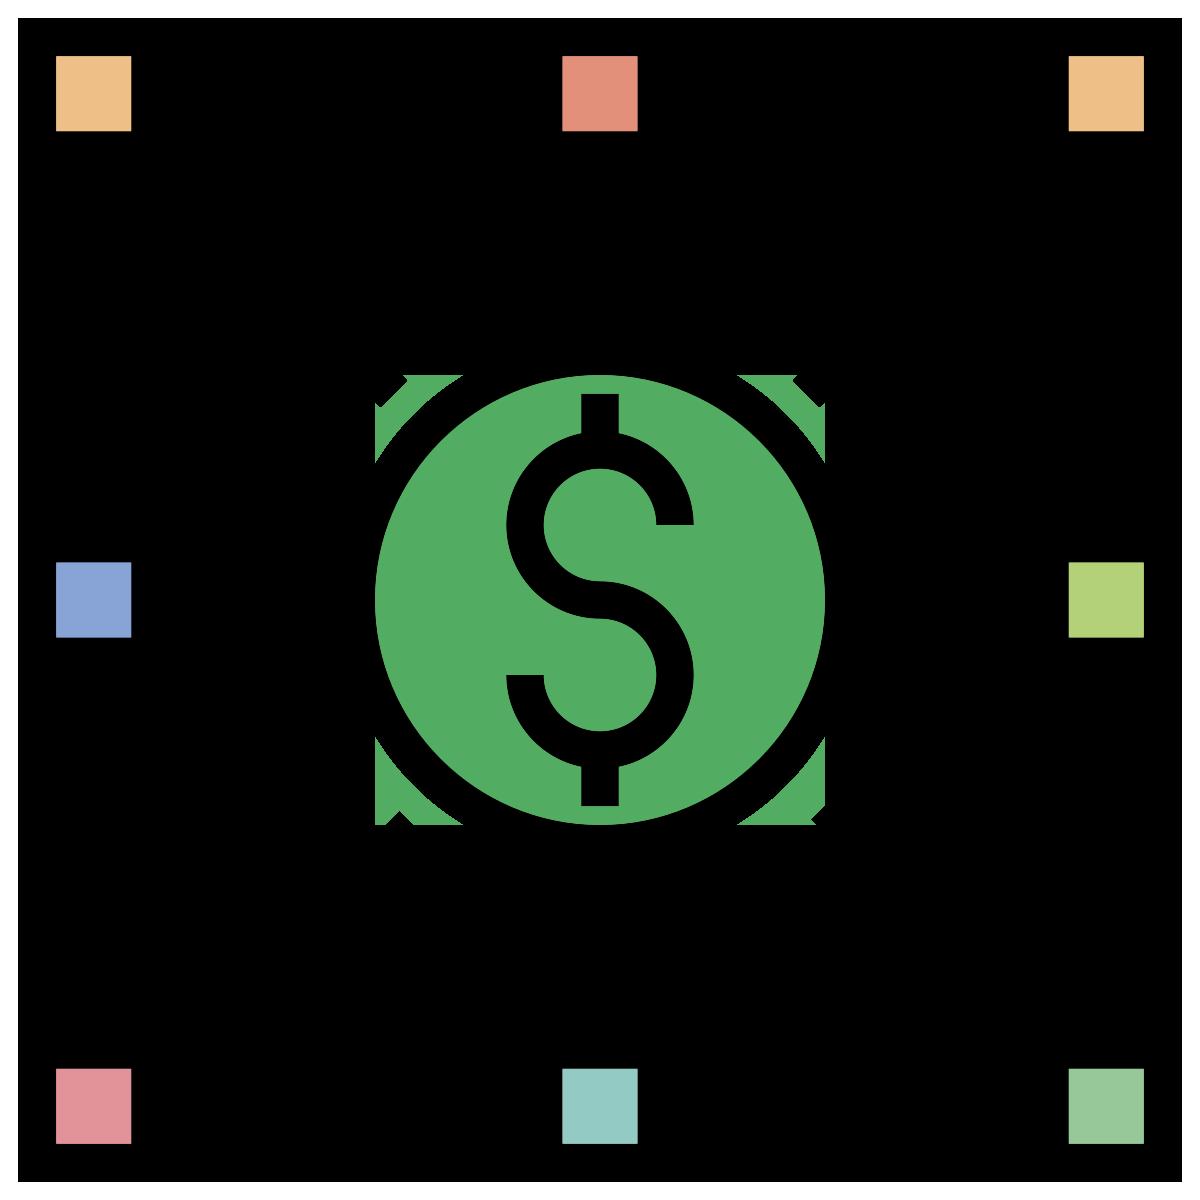 noun_cost_2332478_000000.png